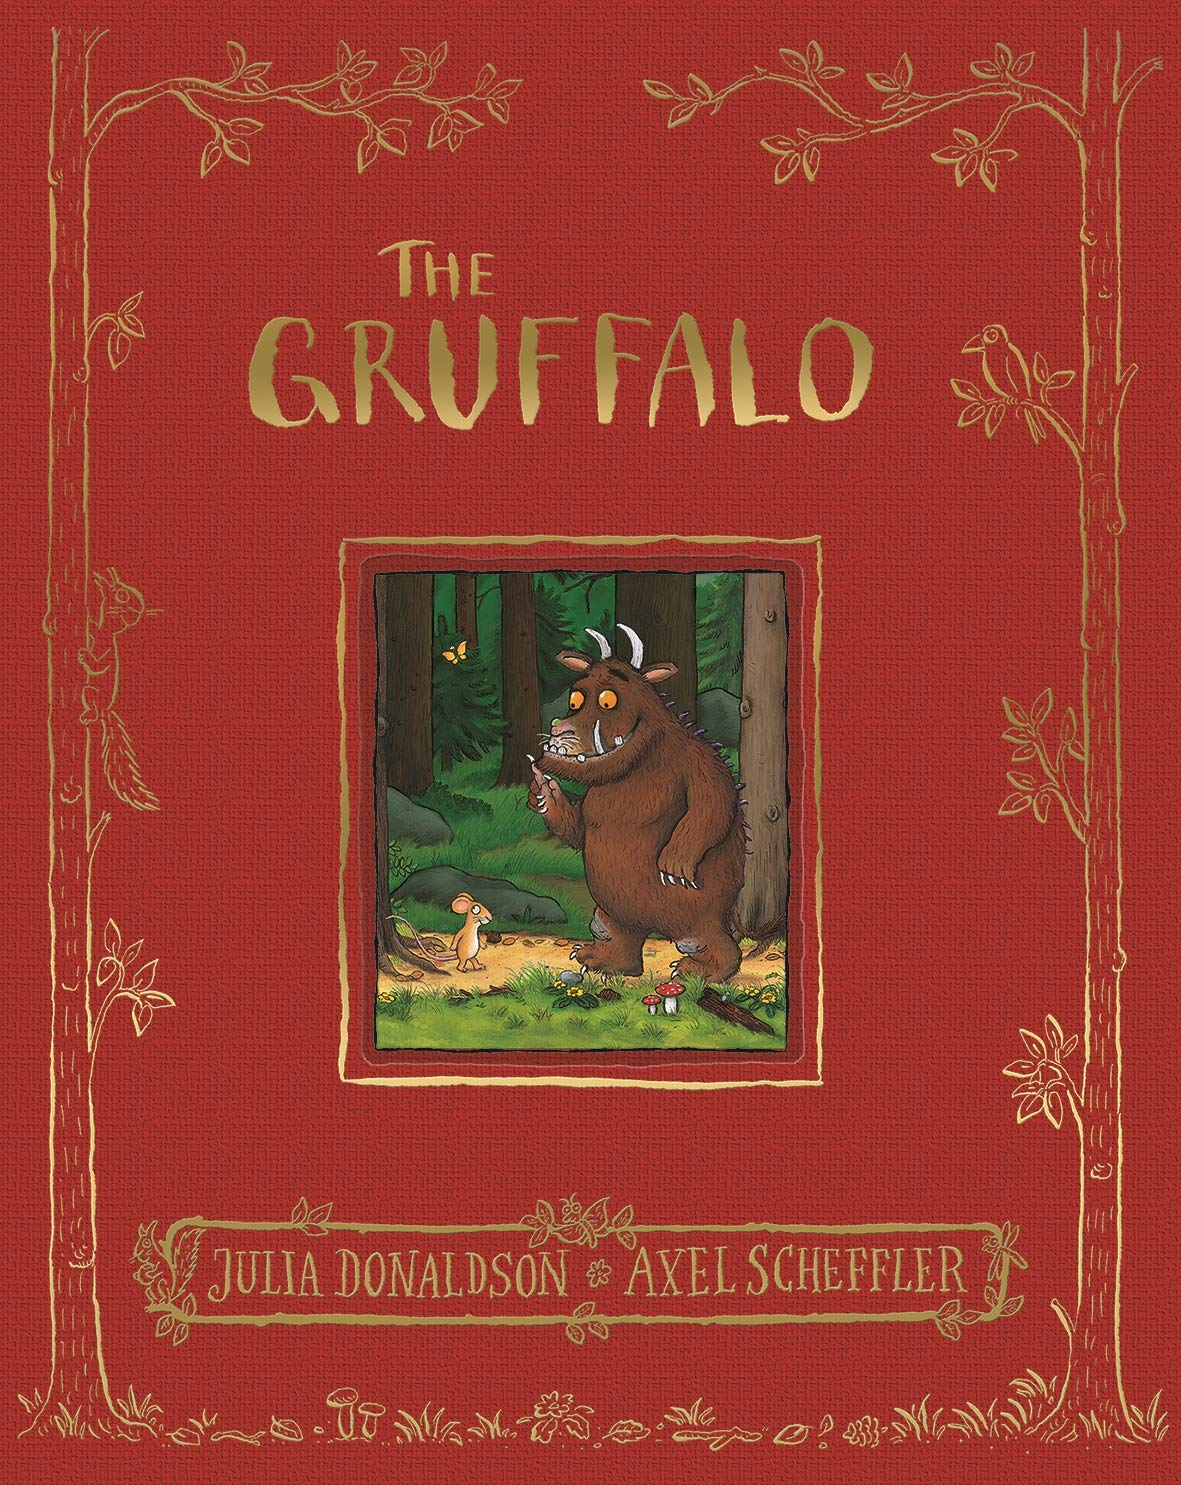 Gruffalo Deluxe: Amazon.es: Donaldson, Julia: Libros en idiomas extranjeros